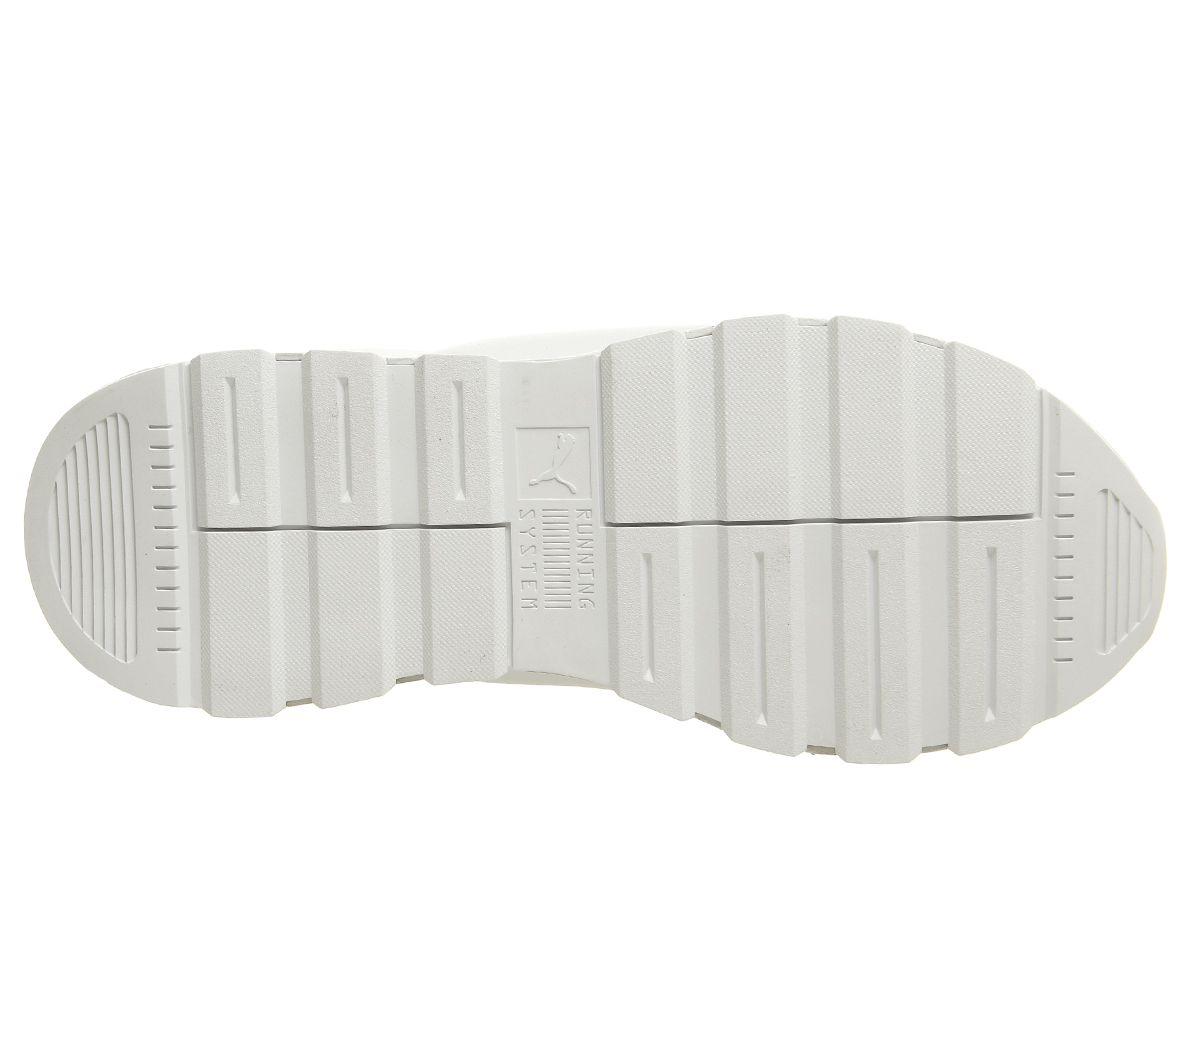 080bf533d4 Donna-Puma-Rs-0-Ottica-Bianco-Argento-Scarpe miniatura